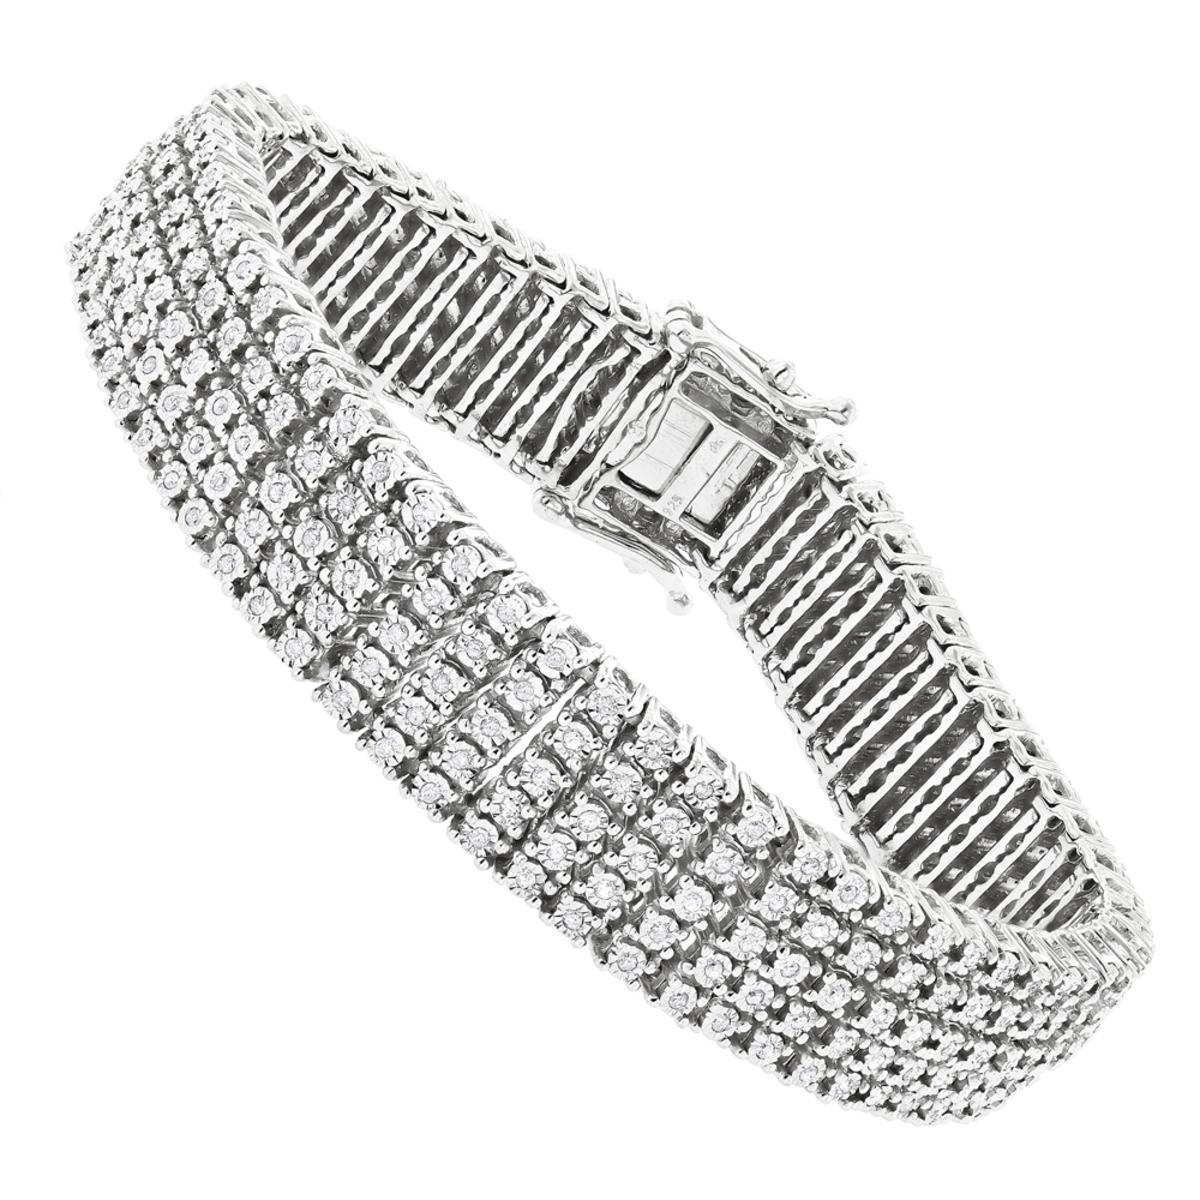 5 Row Mens Diamond Tennis Bracelet in Sterling Silver 1.75 carat Gold Plted